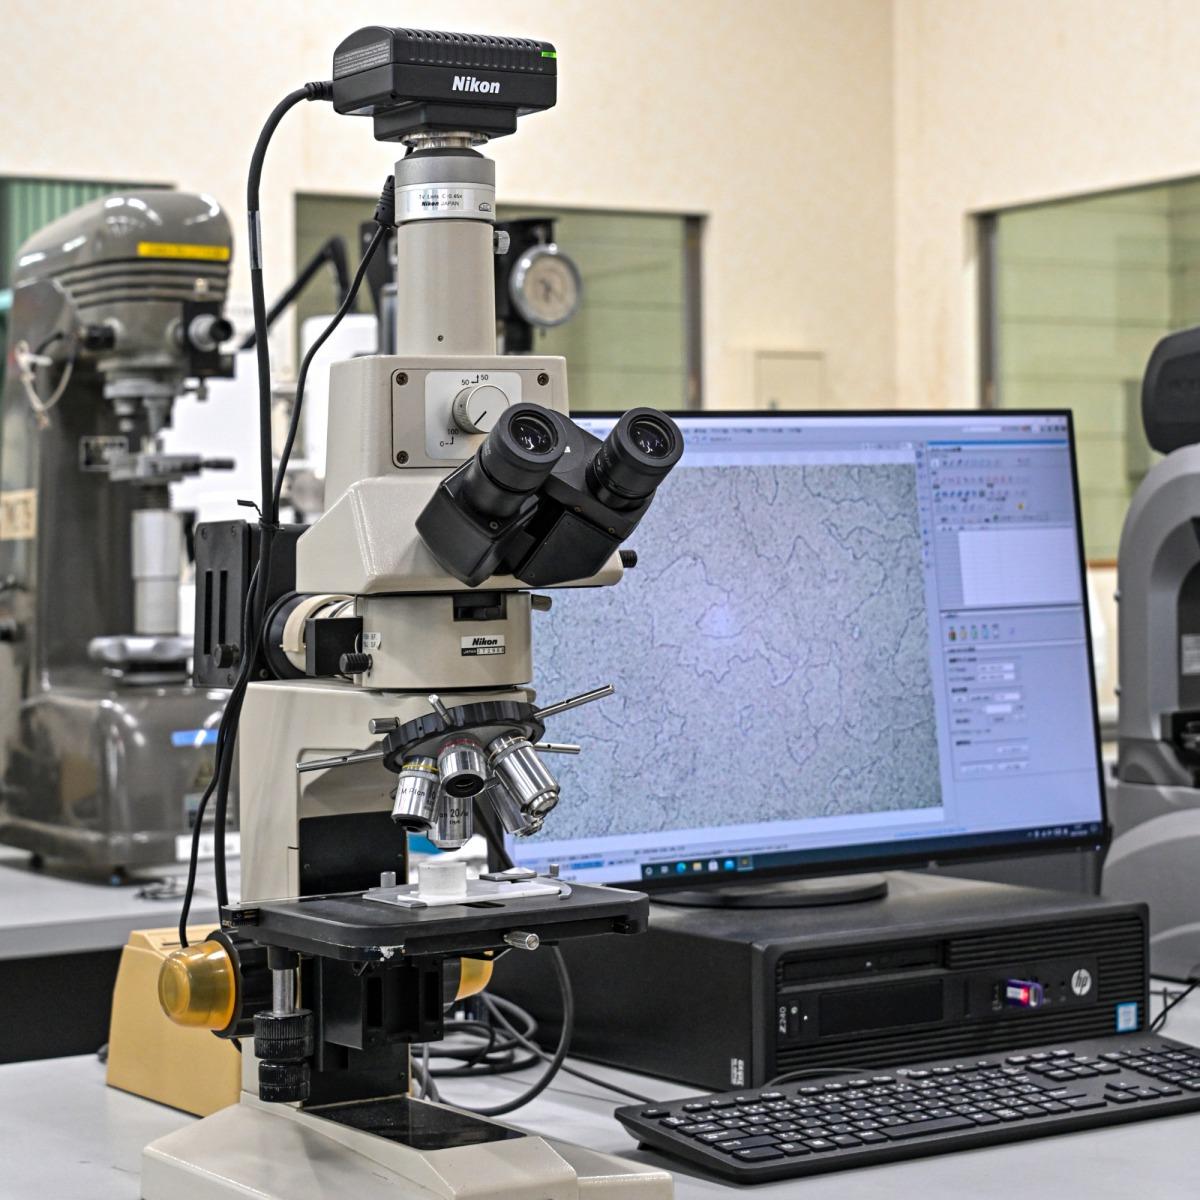 Metallurgical Microscope with Digital Camera Control Unit